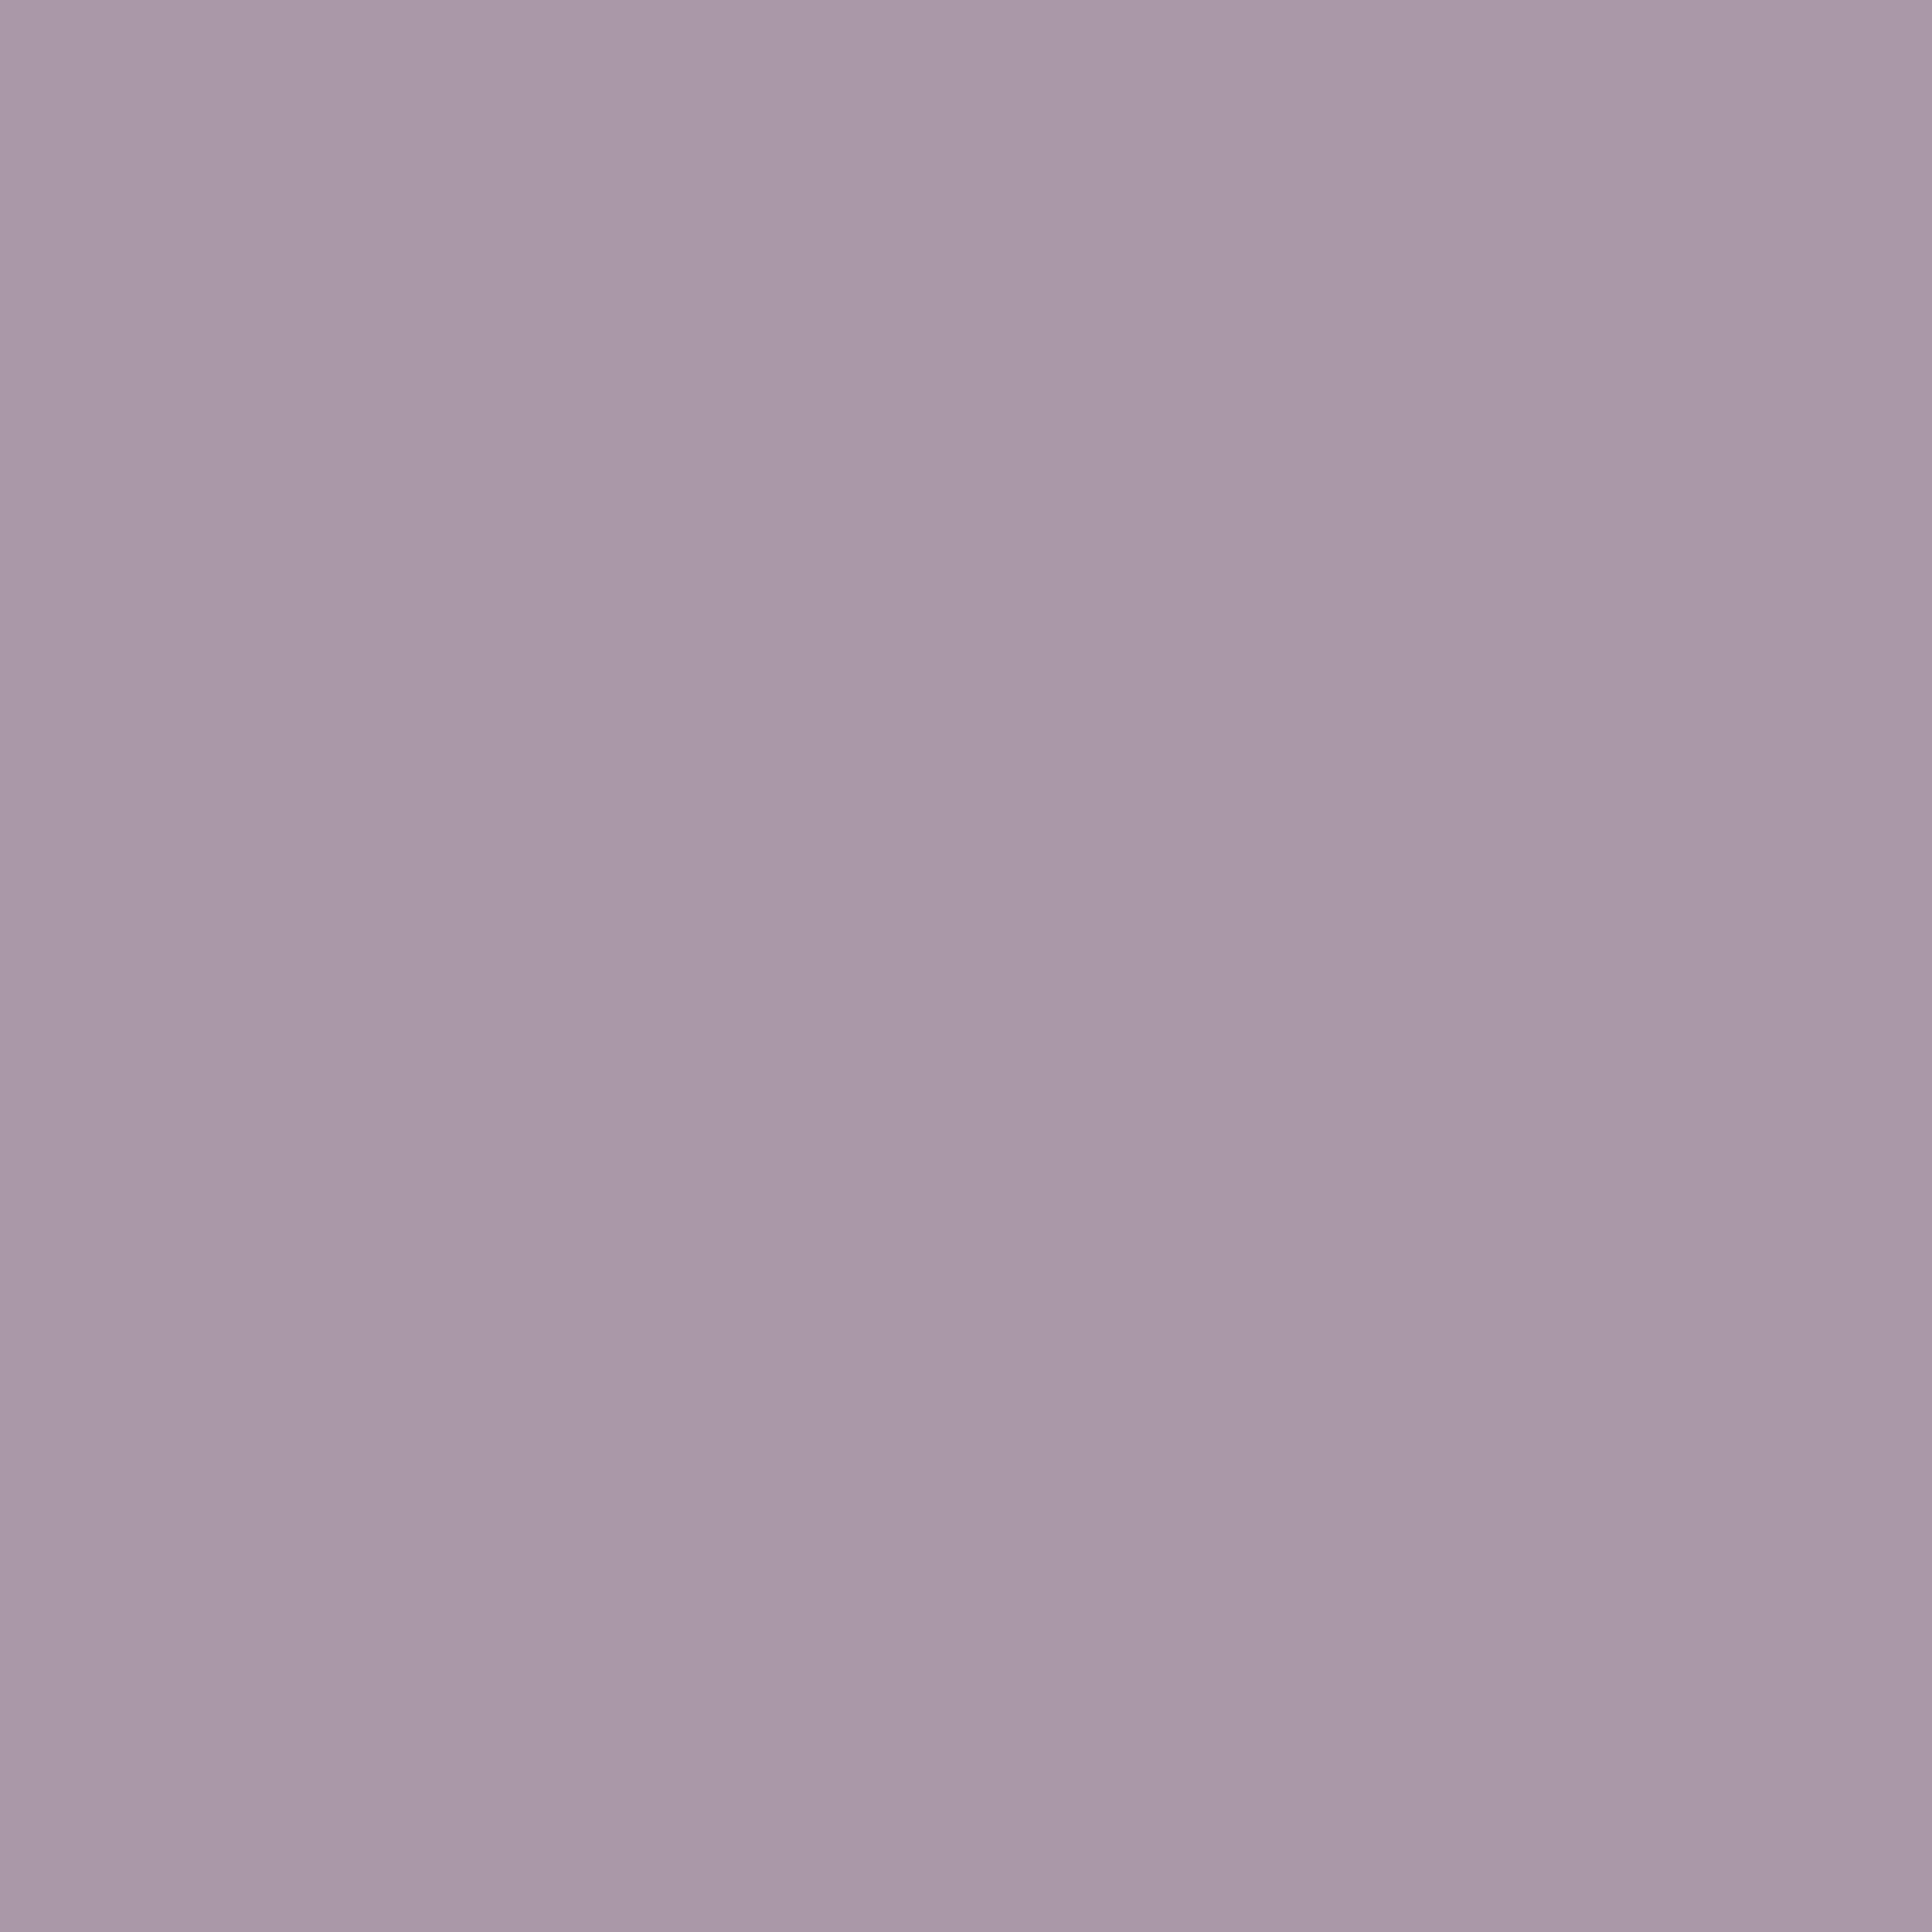 2732x2732 Rose Quartz Solid Color Background